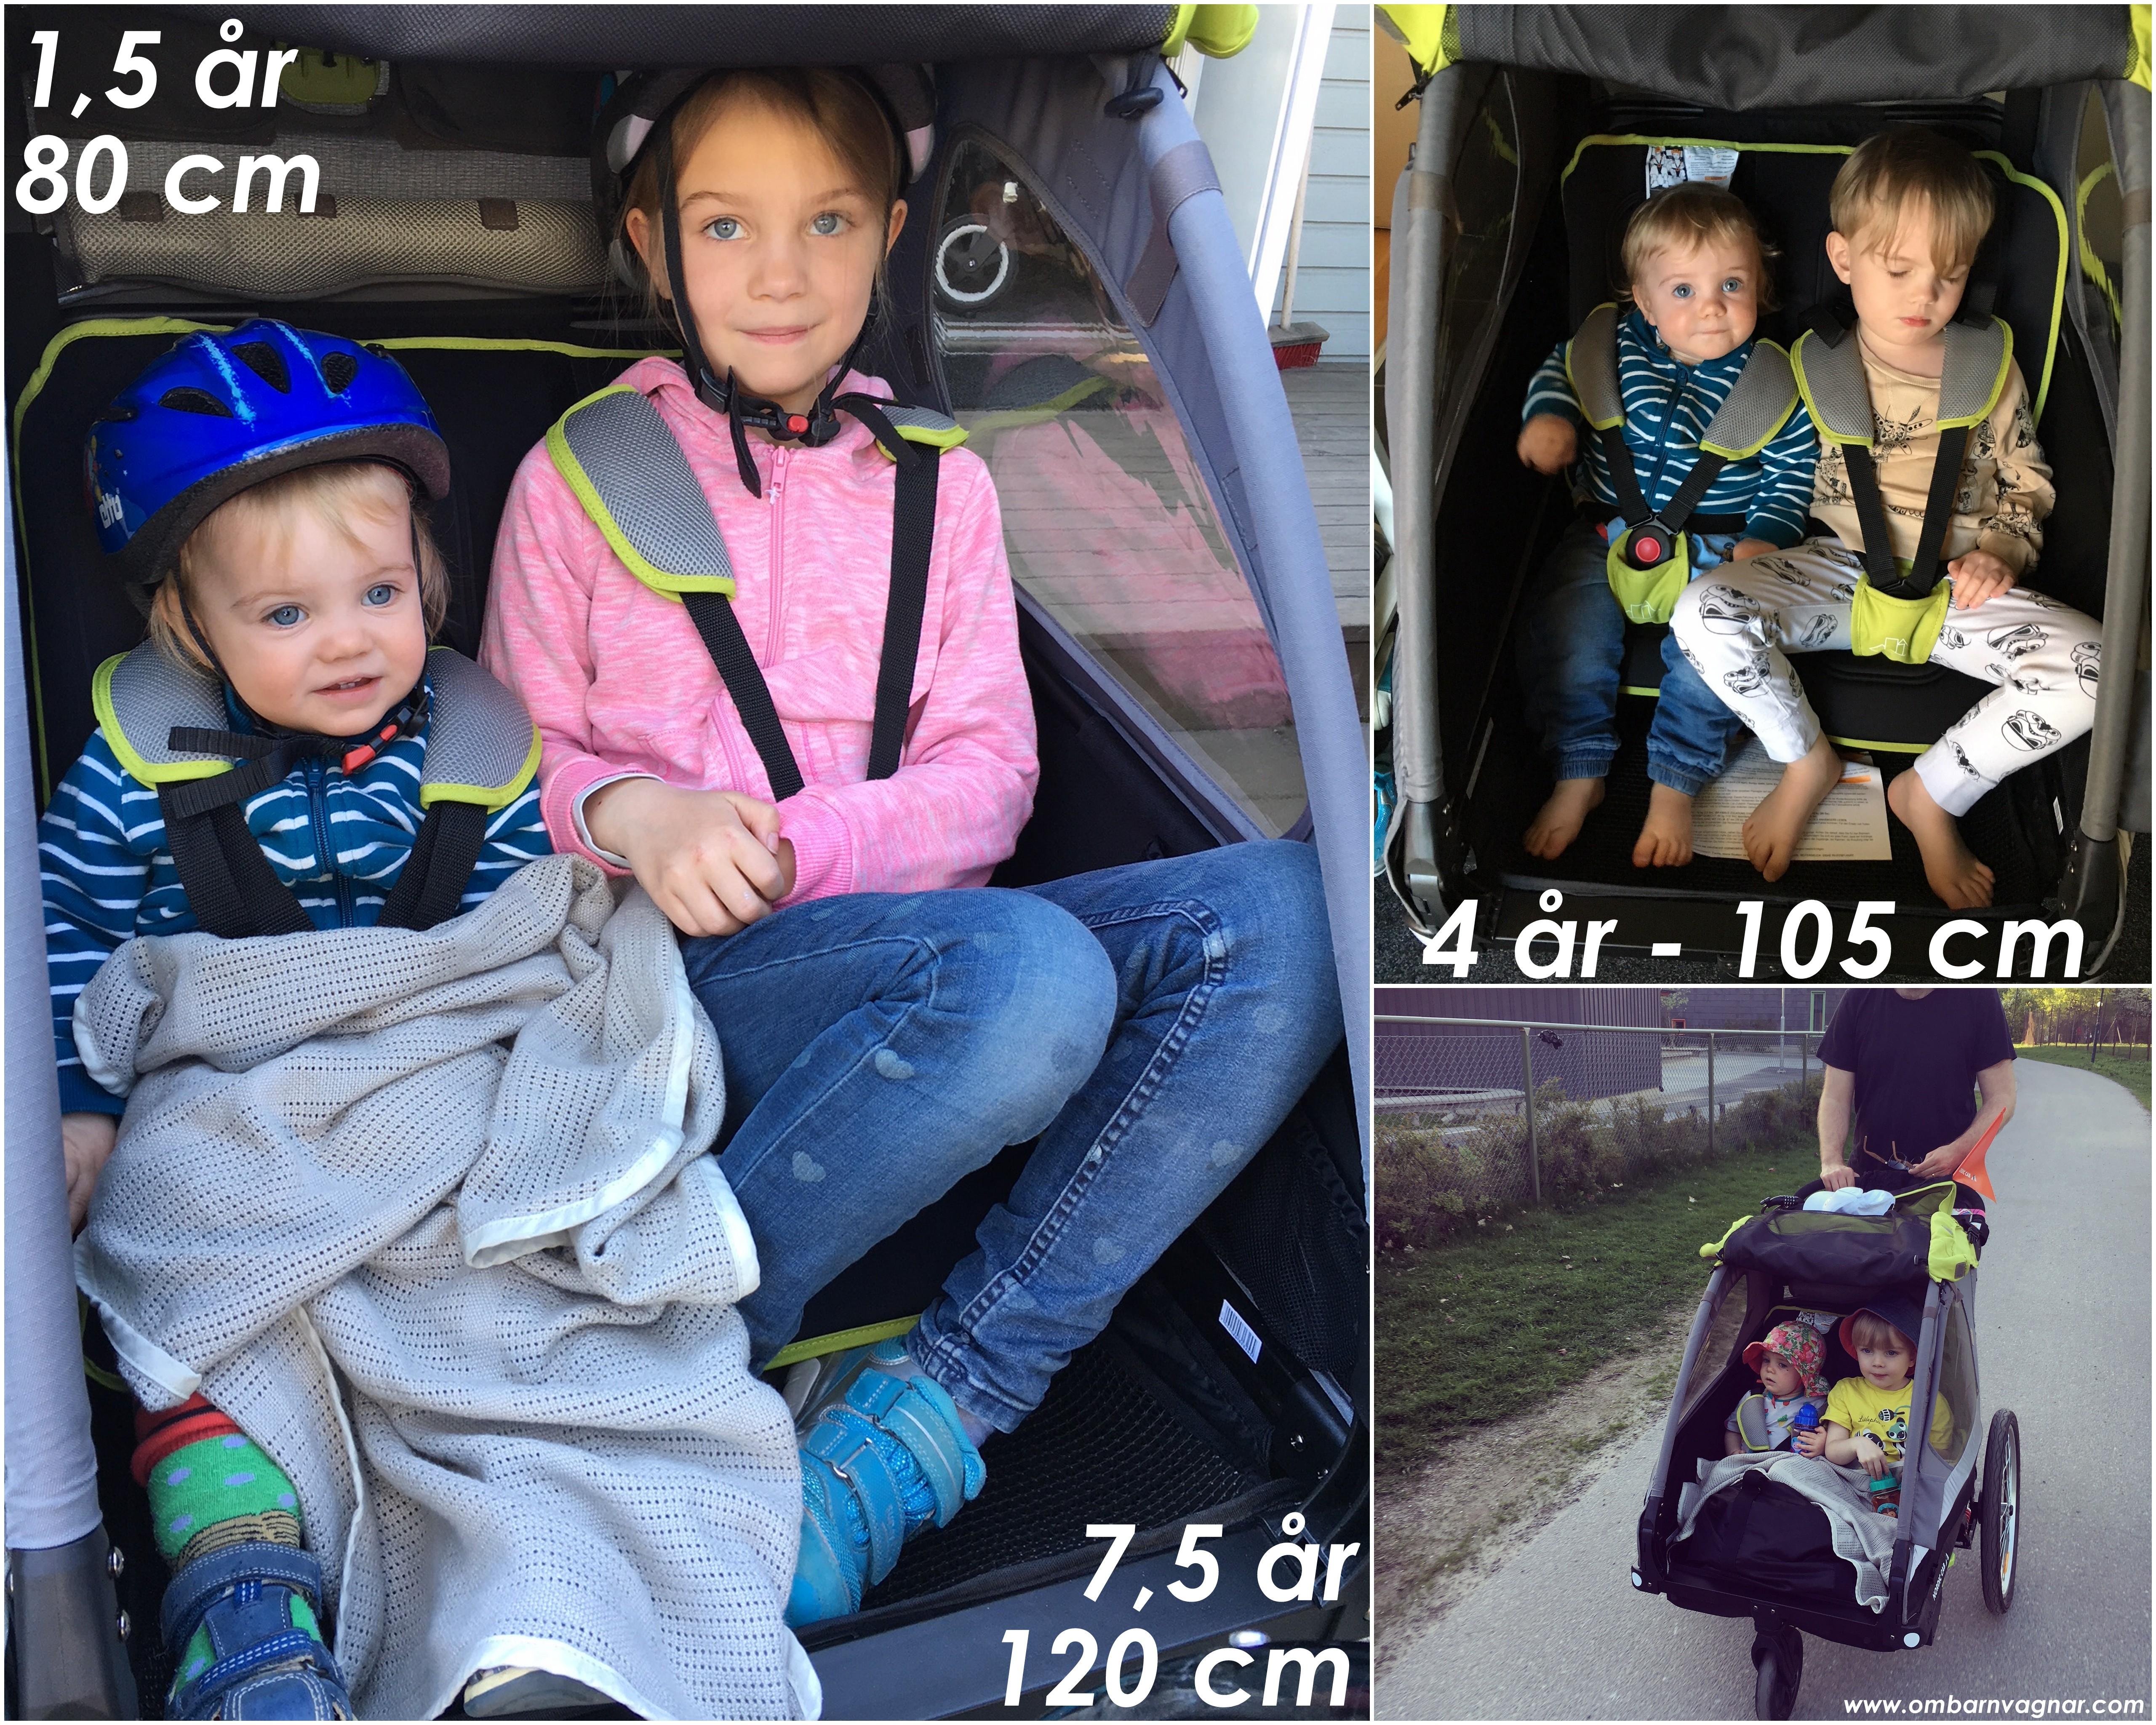 Nordic Cab Active 2-in-1 Cykelvagn utrymme för barnen rymlighet